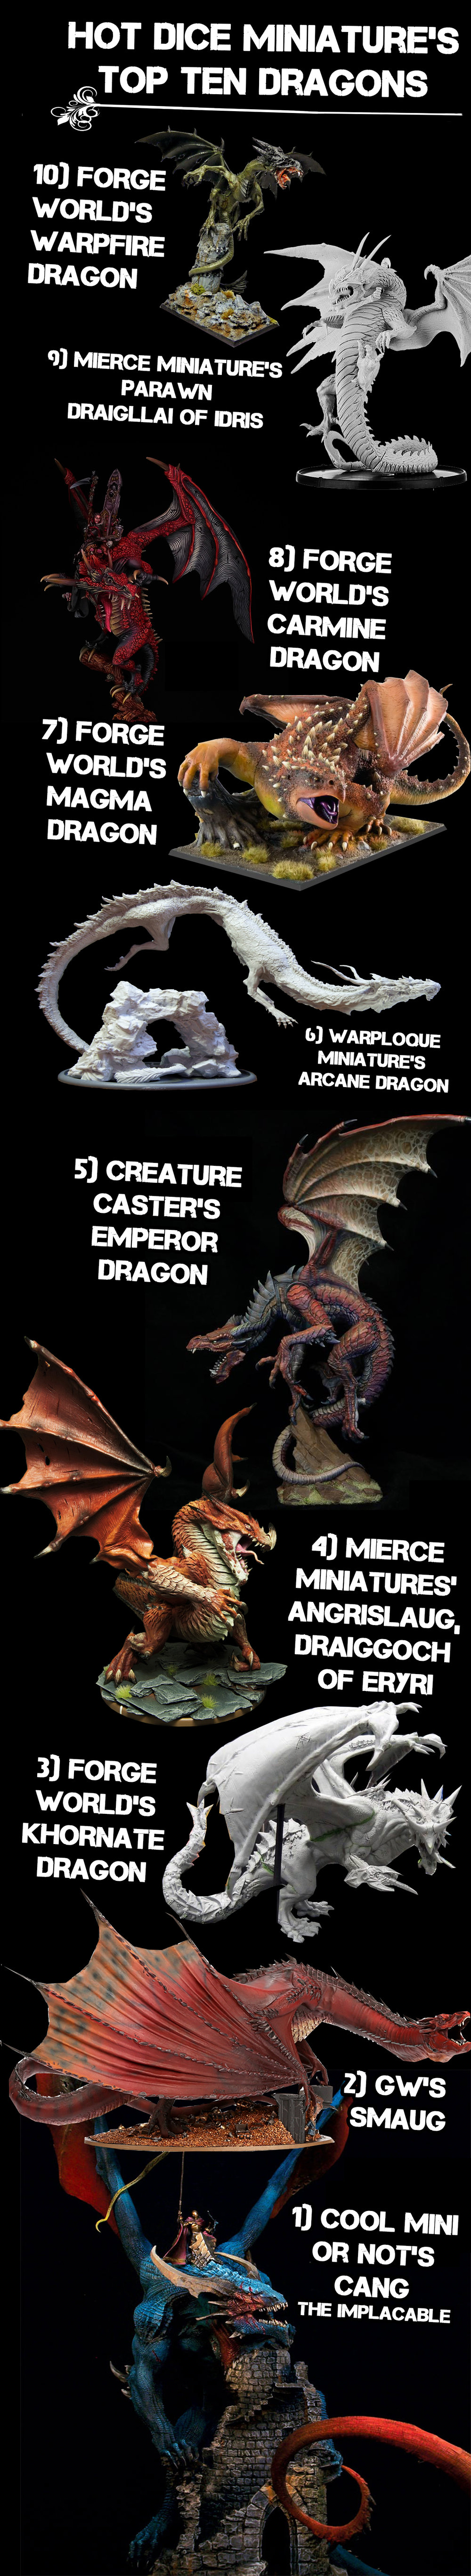 dragonInfographic.jpg